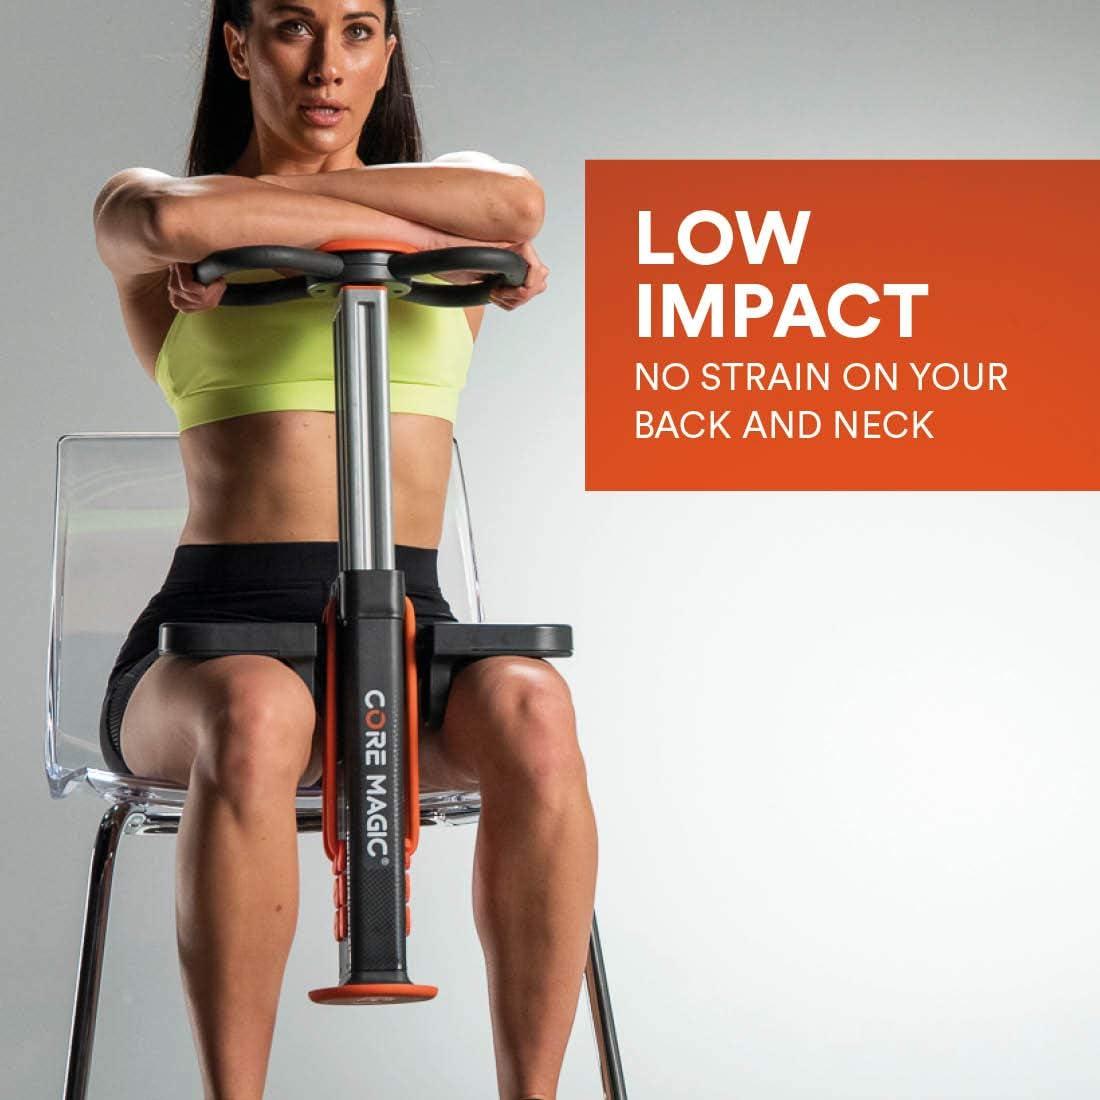 Gris y Naranja New Image Strengthen and Tone Muscles At Home Core Magic Entrenador Bonus Workout Videos